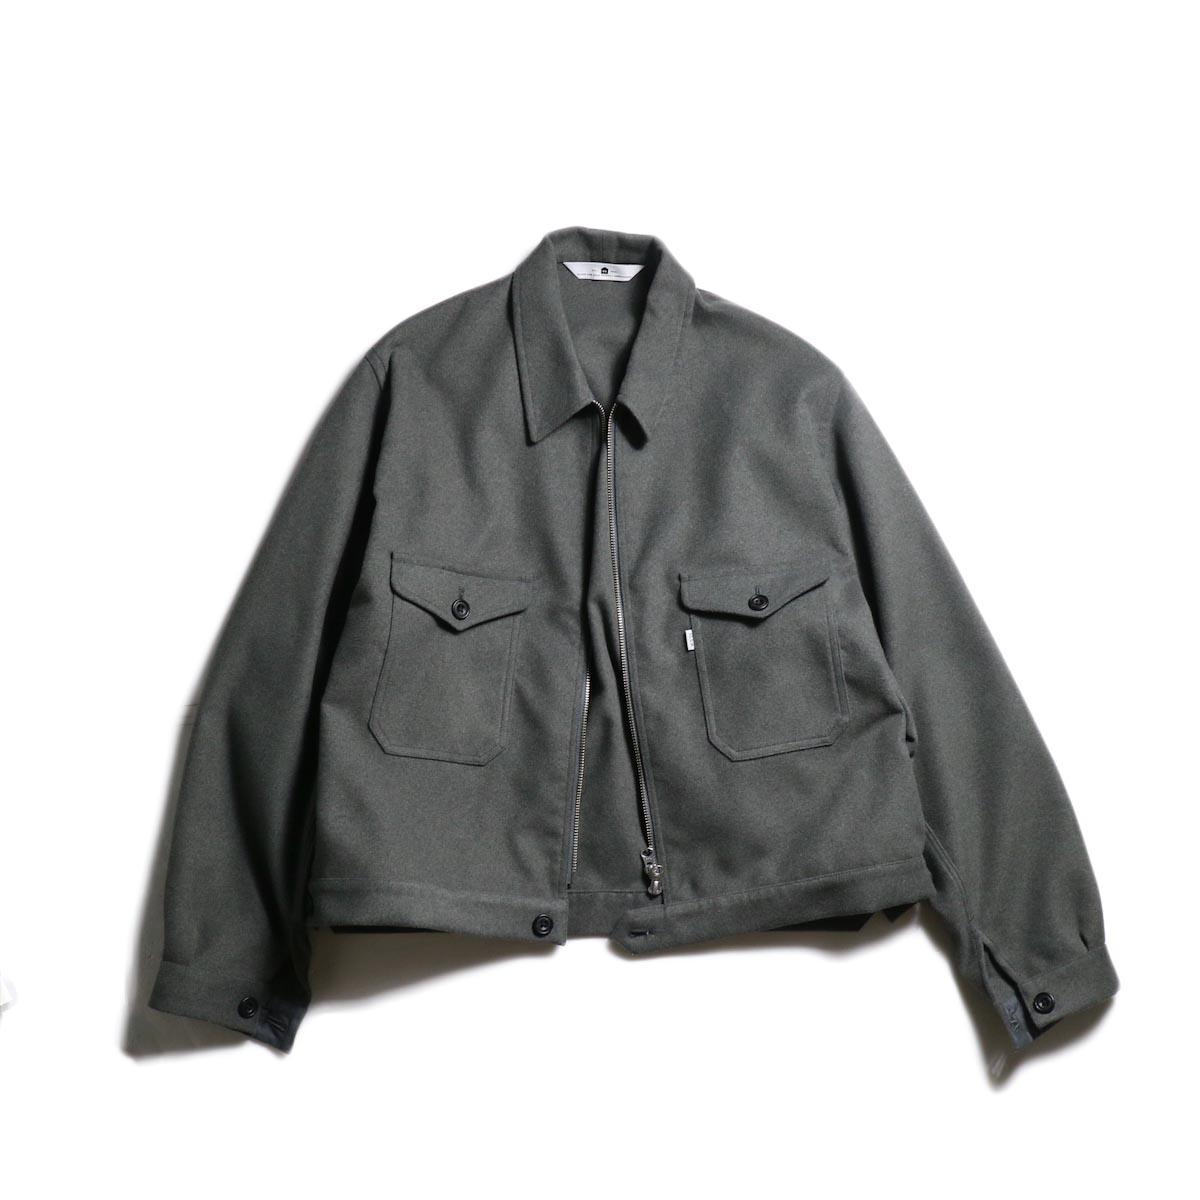 SGGM / Worker Zip Blouson (Charcoal)